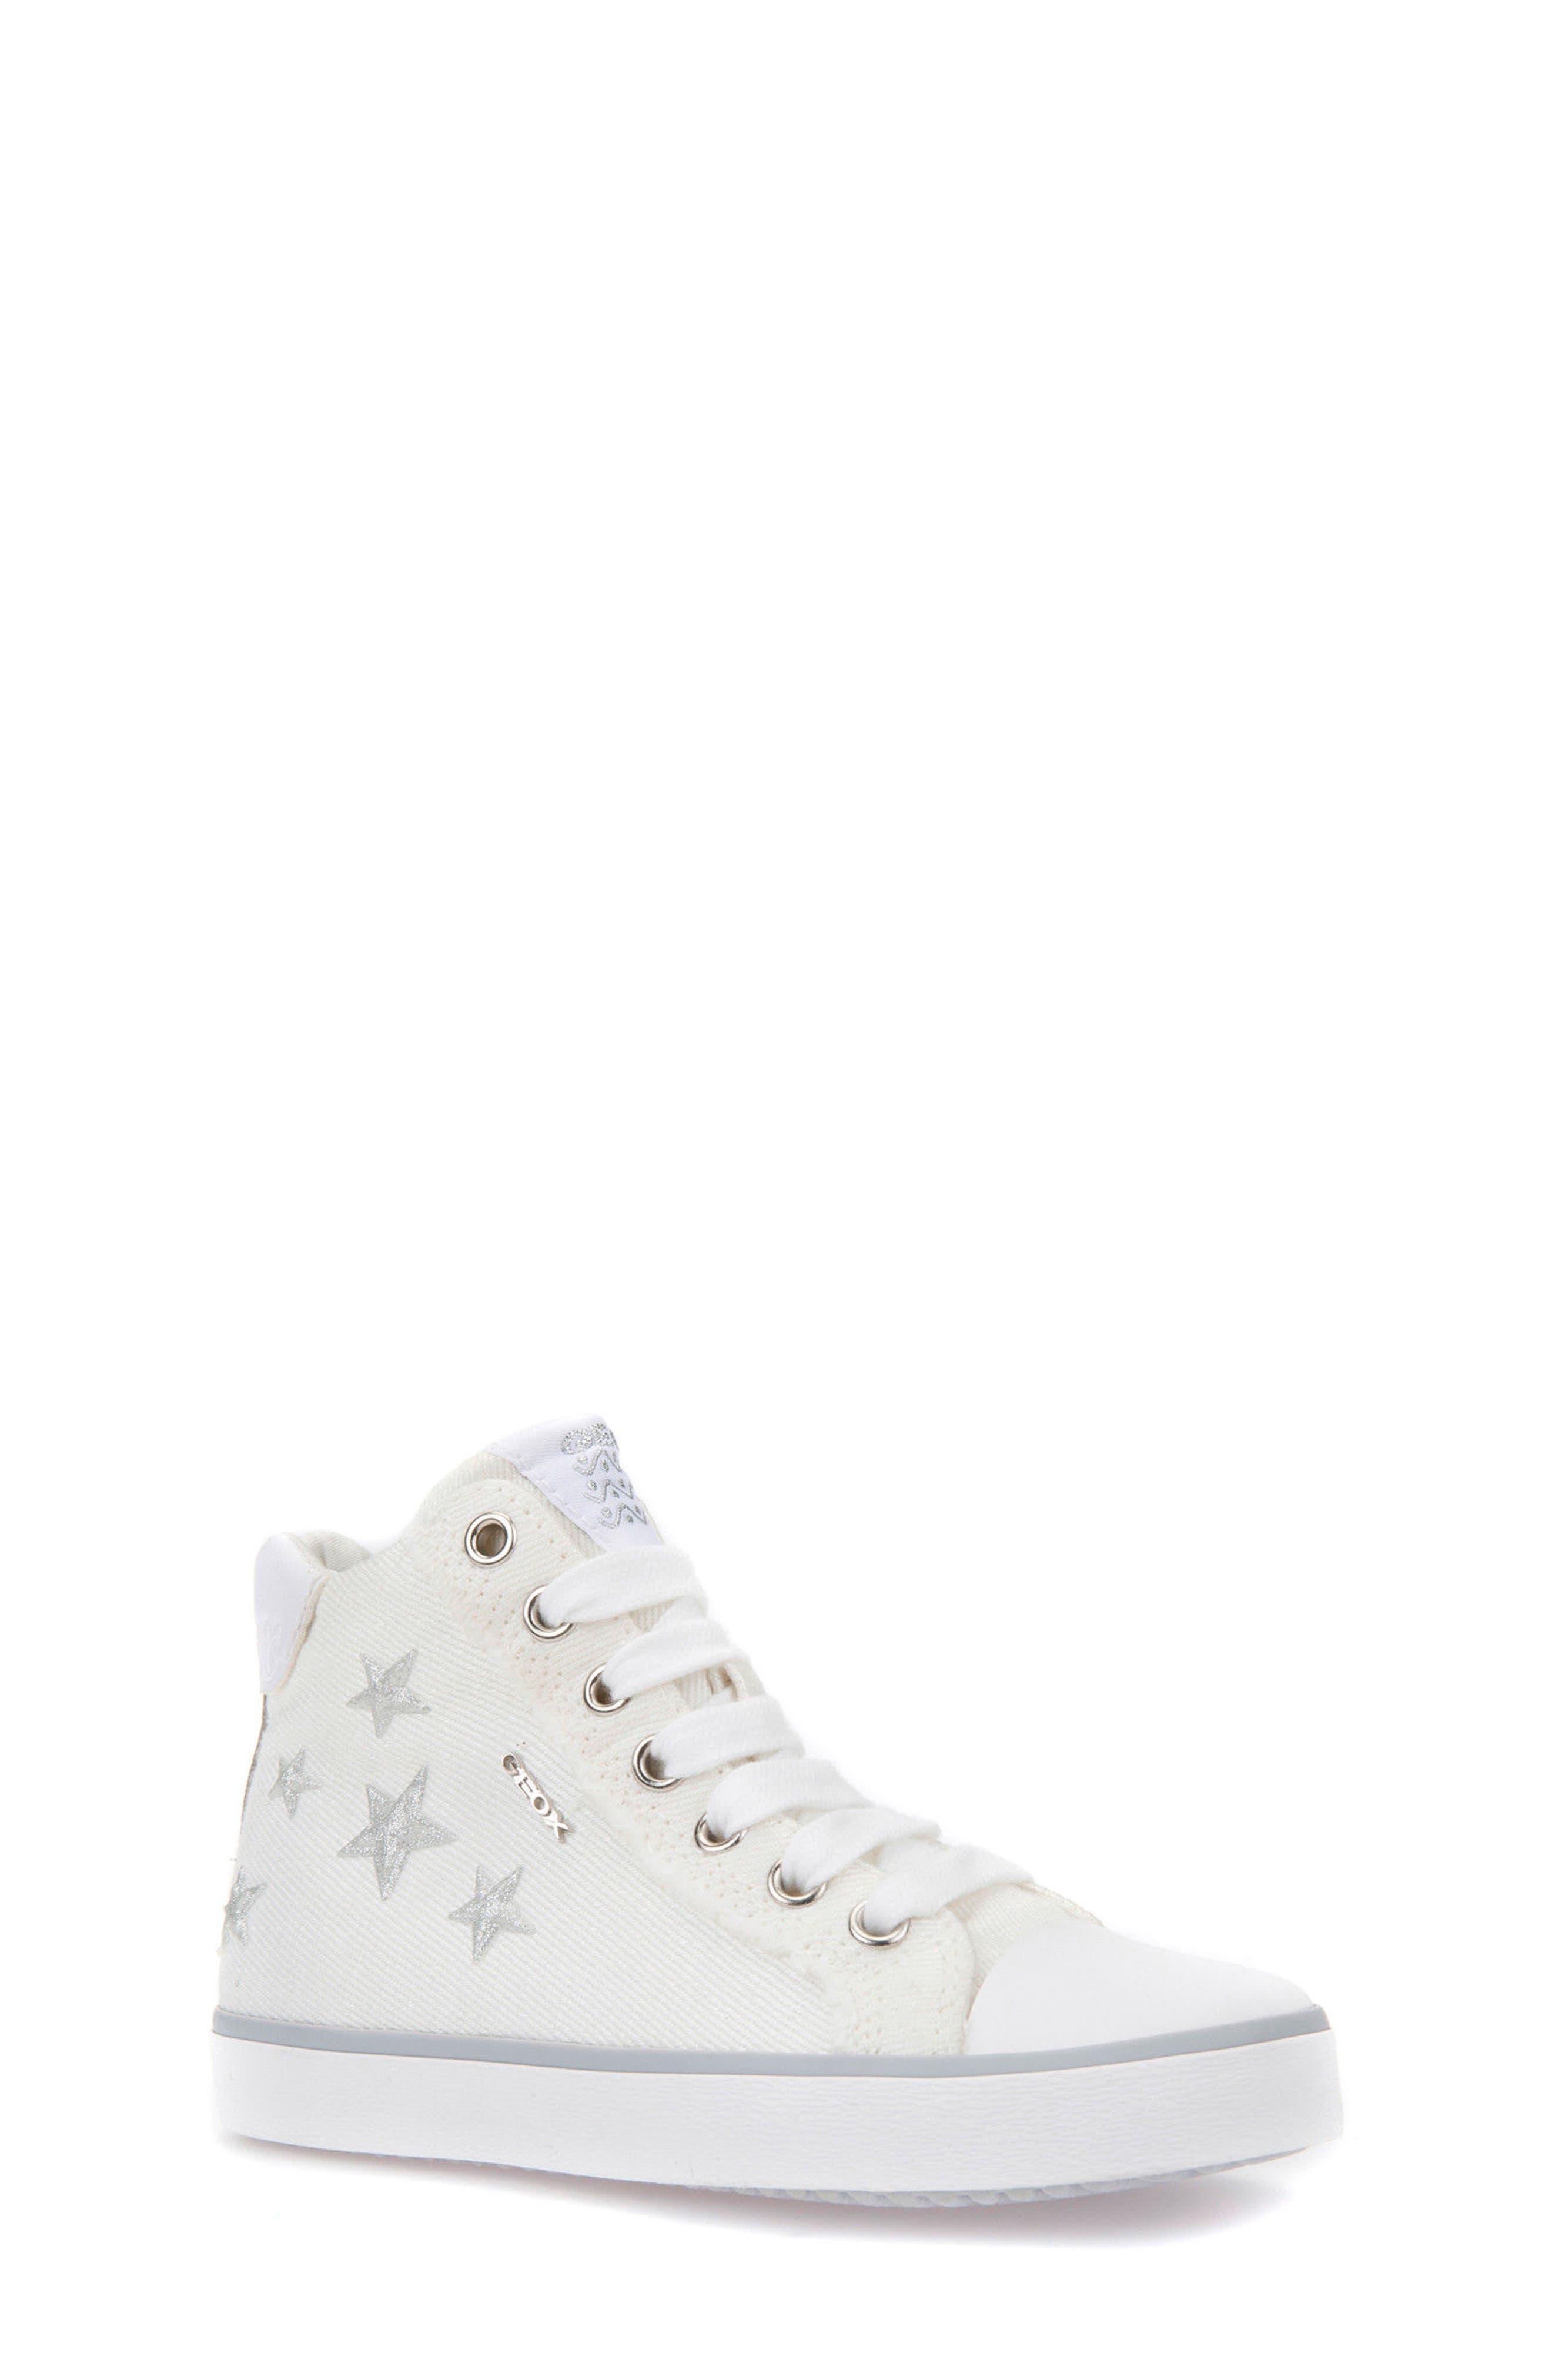 Kilwi High Top Zip Sneaker,                             Main thumbnail 1, color,                             WHITE